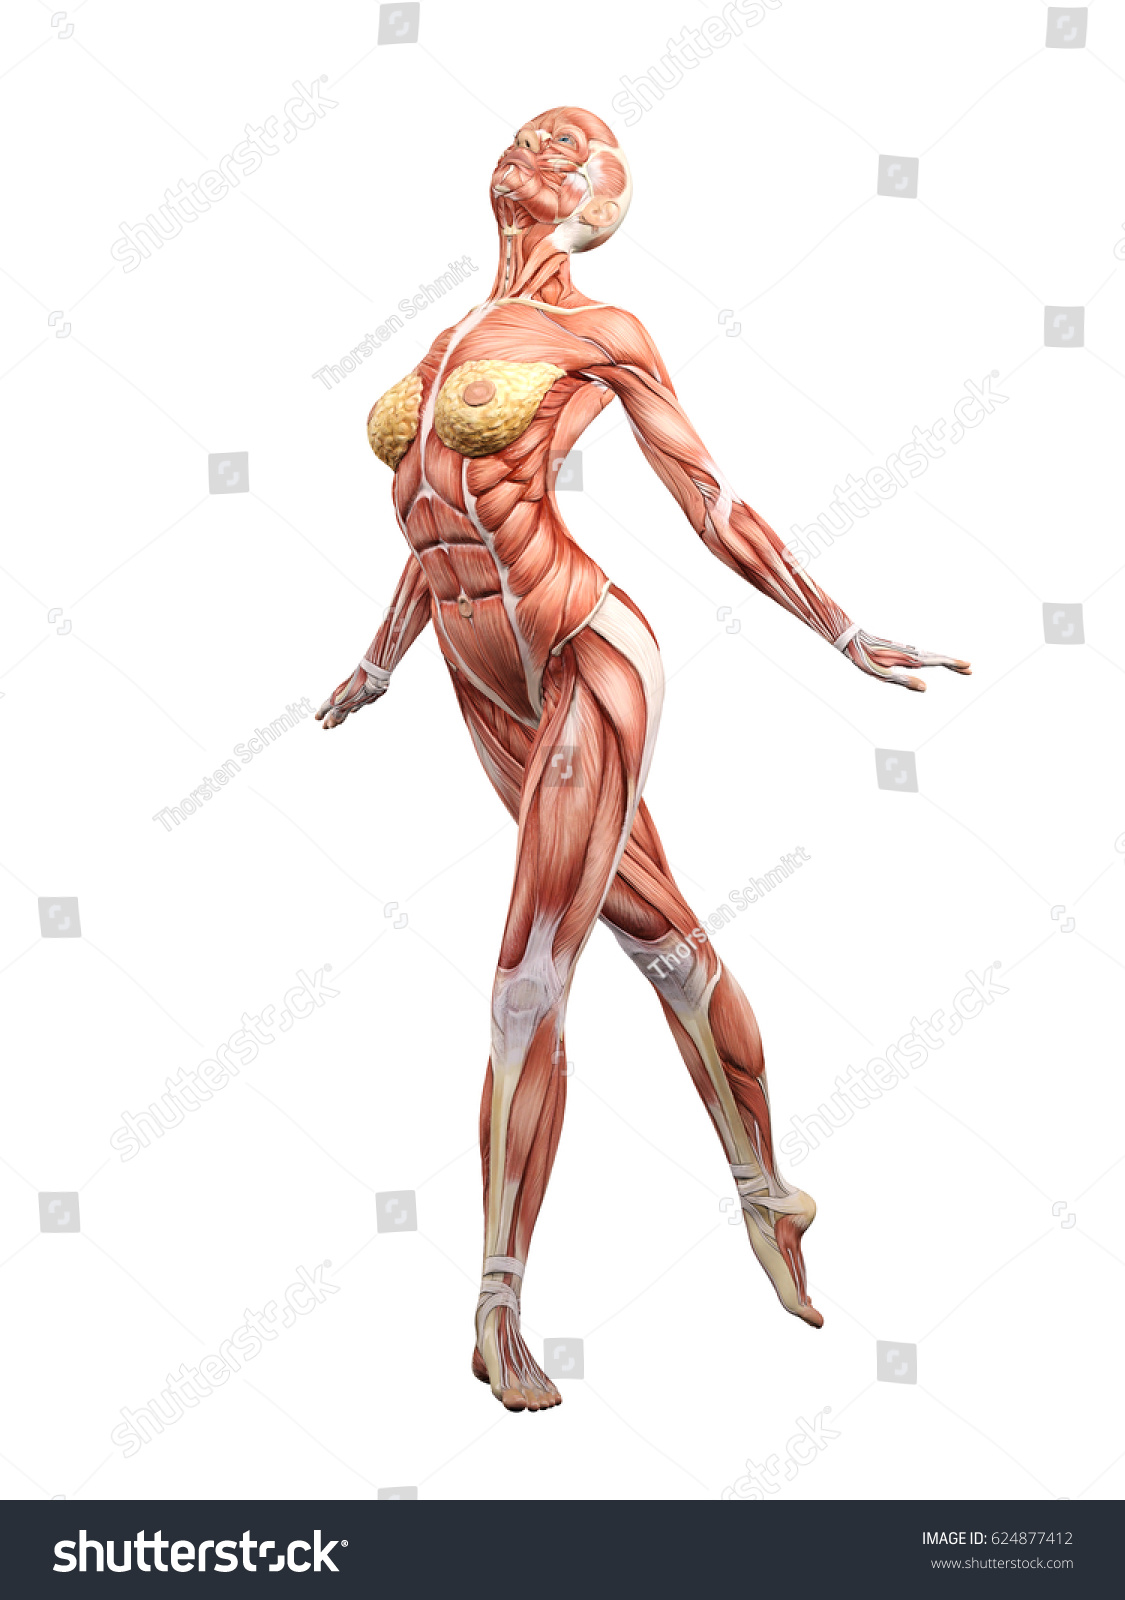 Female Muscle Anatomy Dancing 3 D Illustration Stockillustration